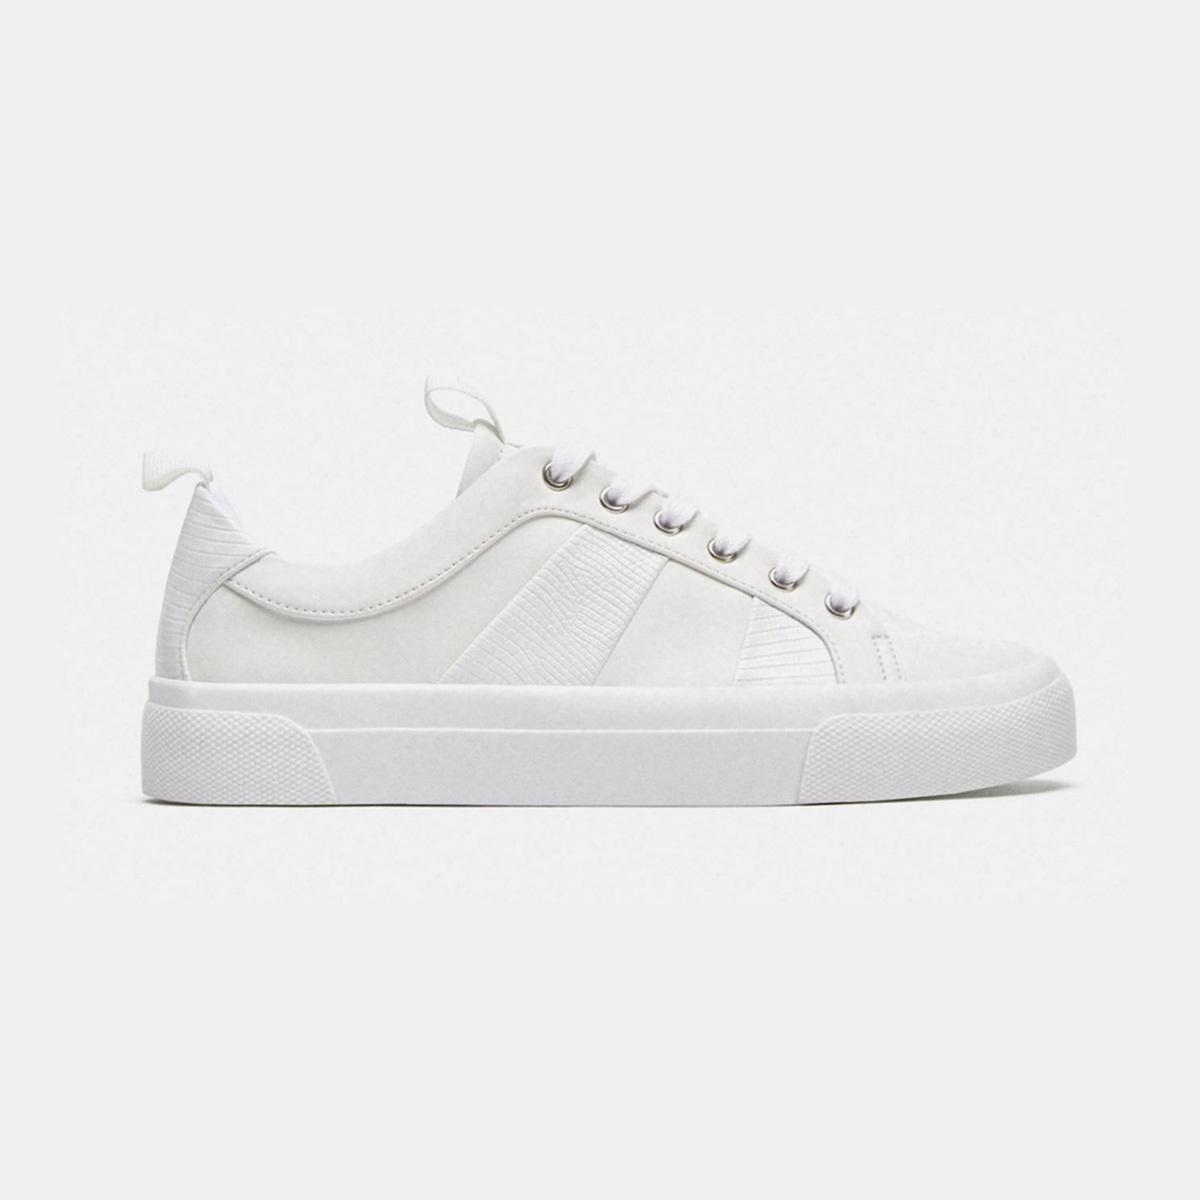 Zapatillas blancas de Zara. (Precio: 25,95 euros).